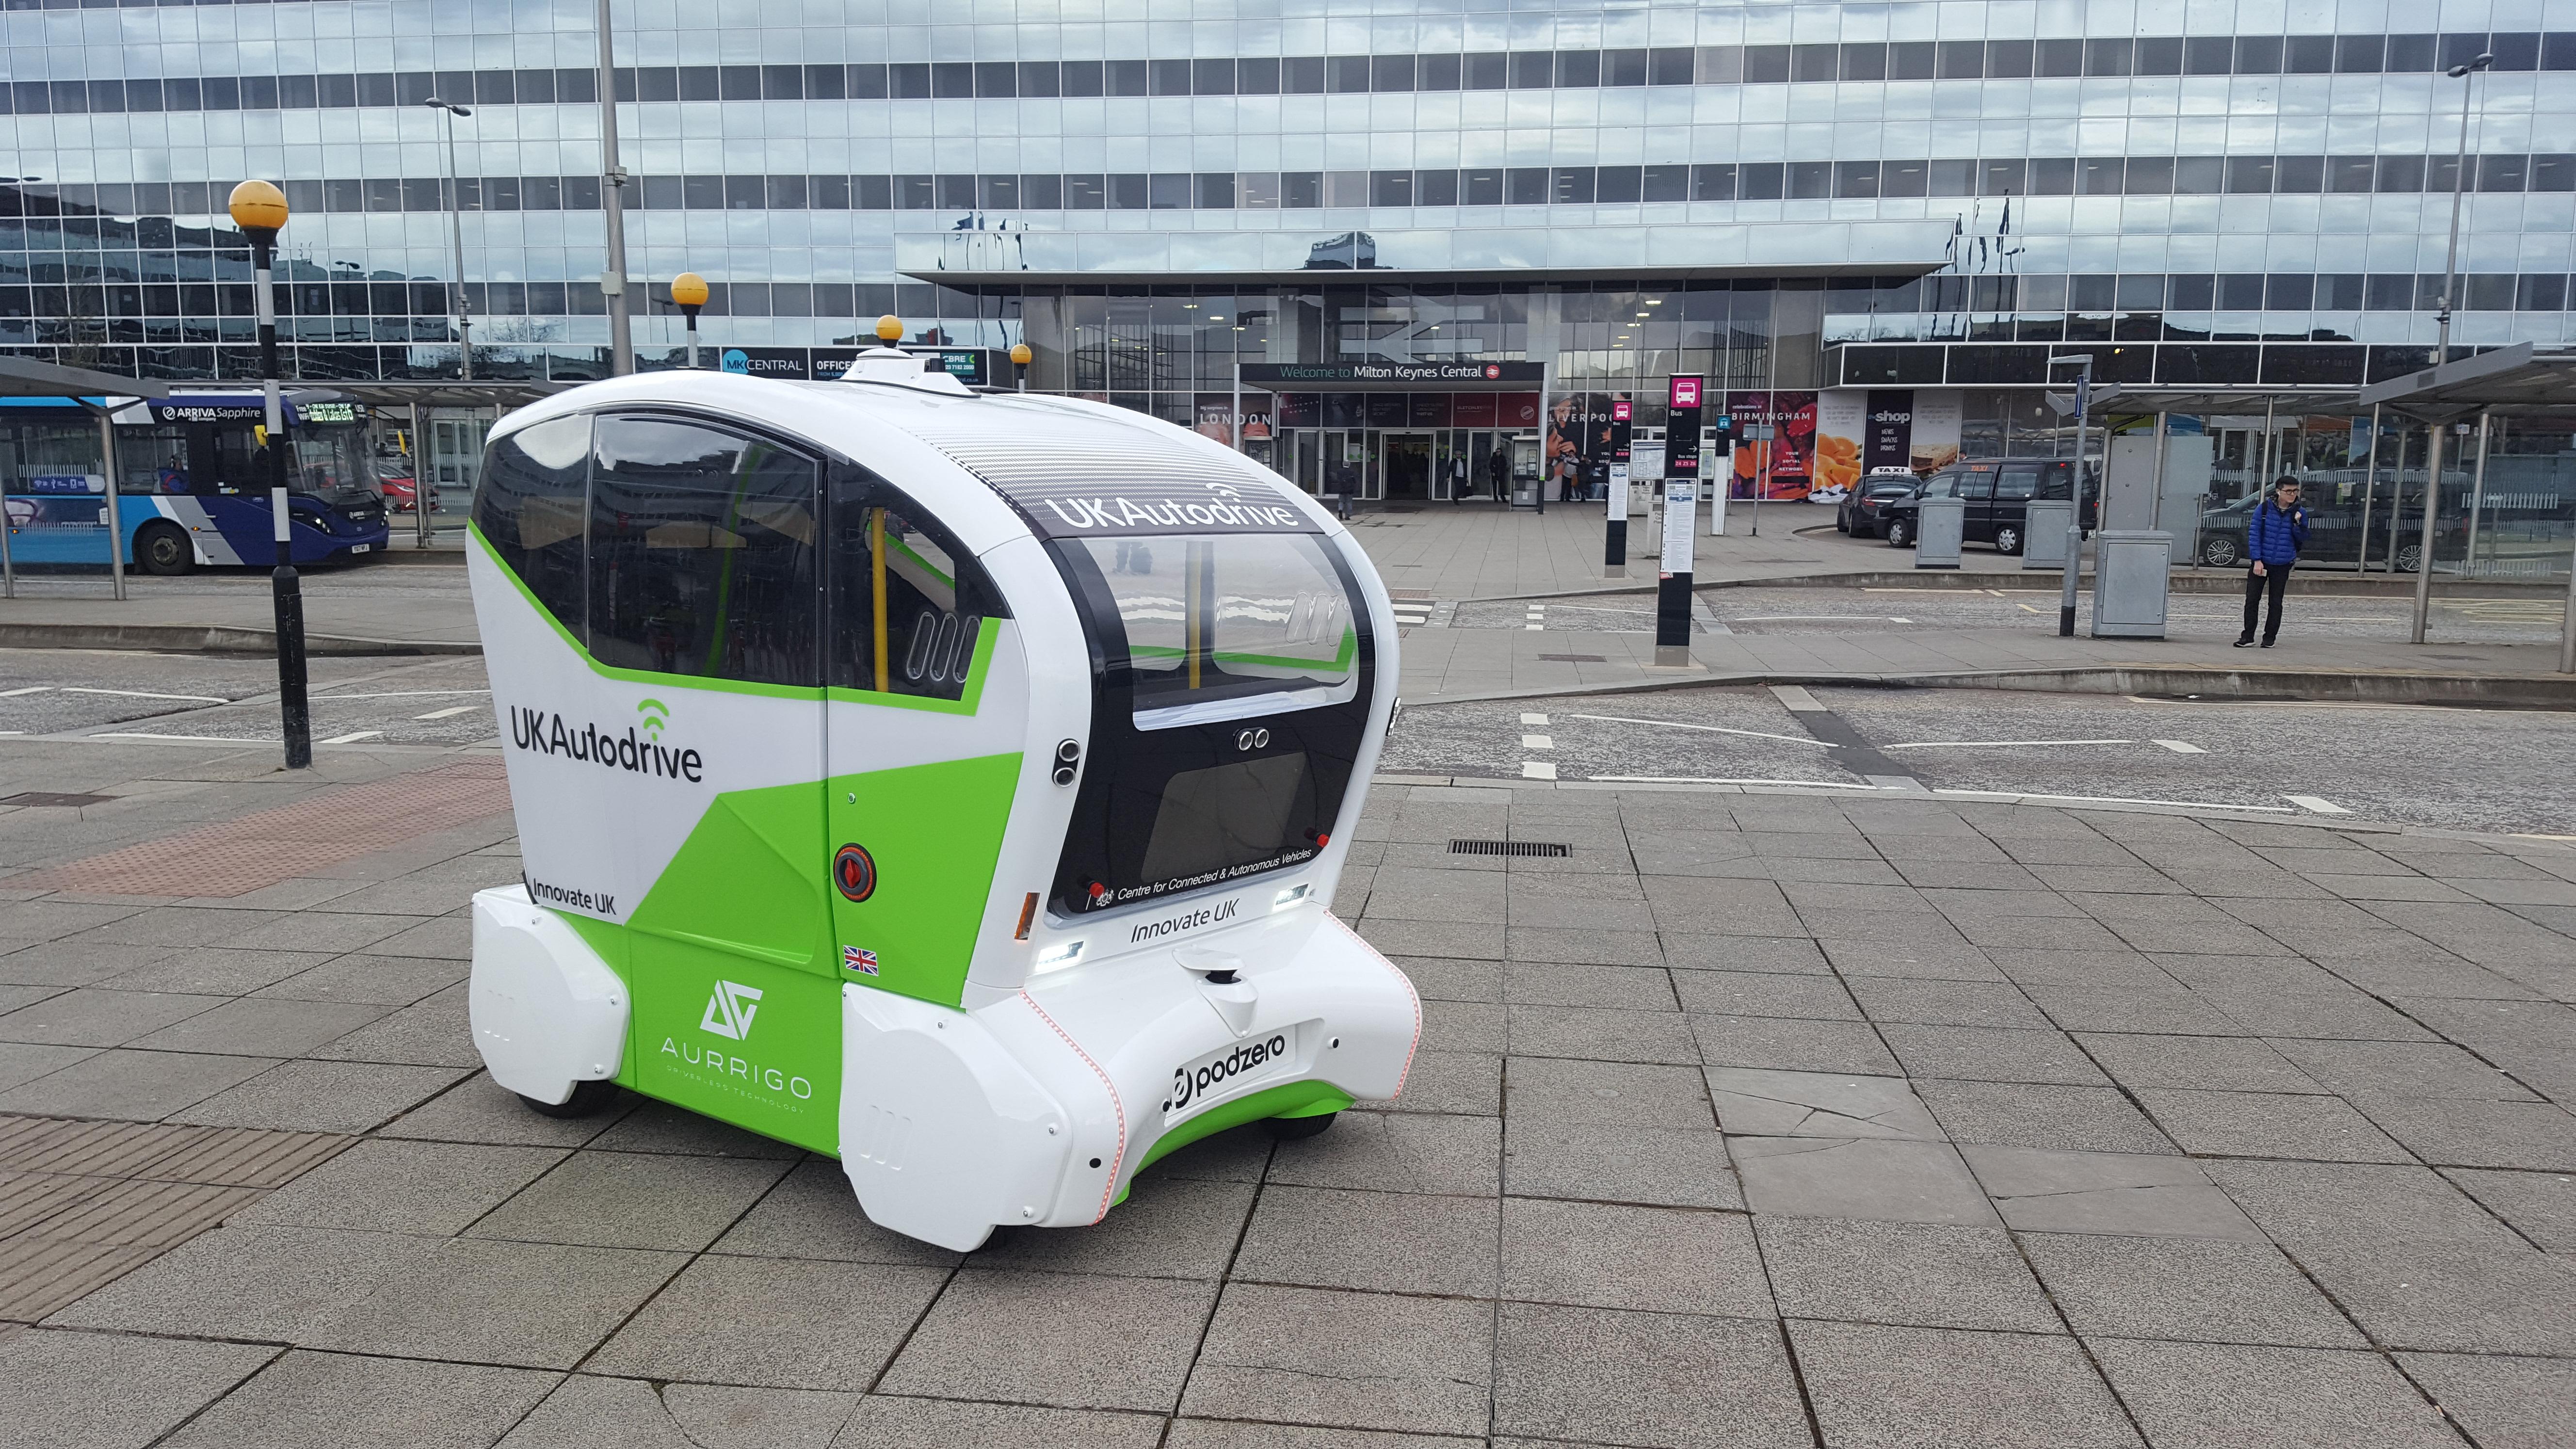 UK Autodrive Pod In Milton Keynes